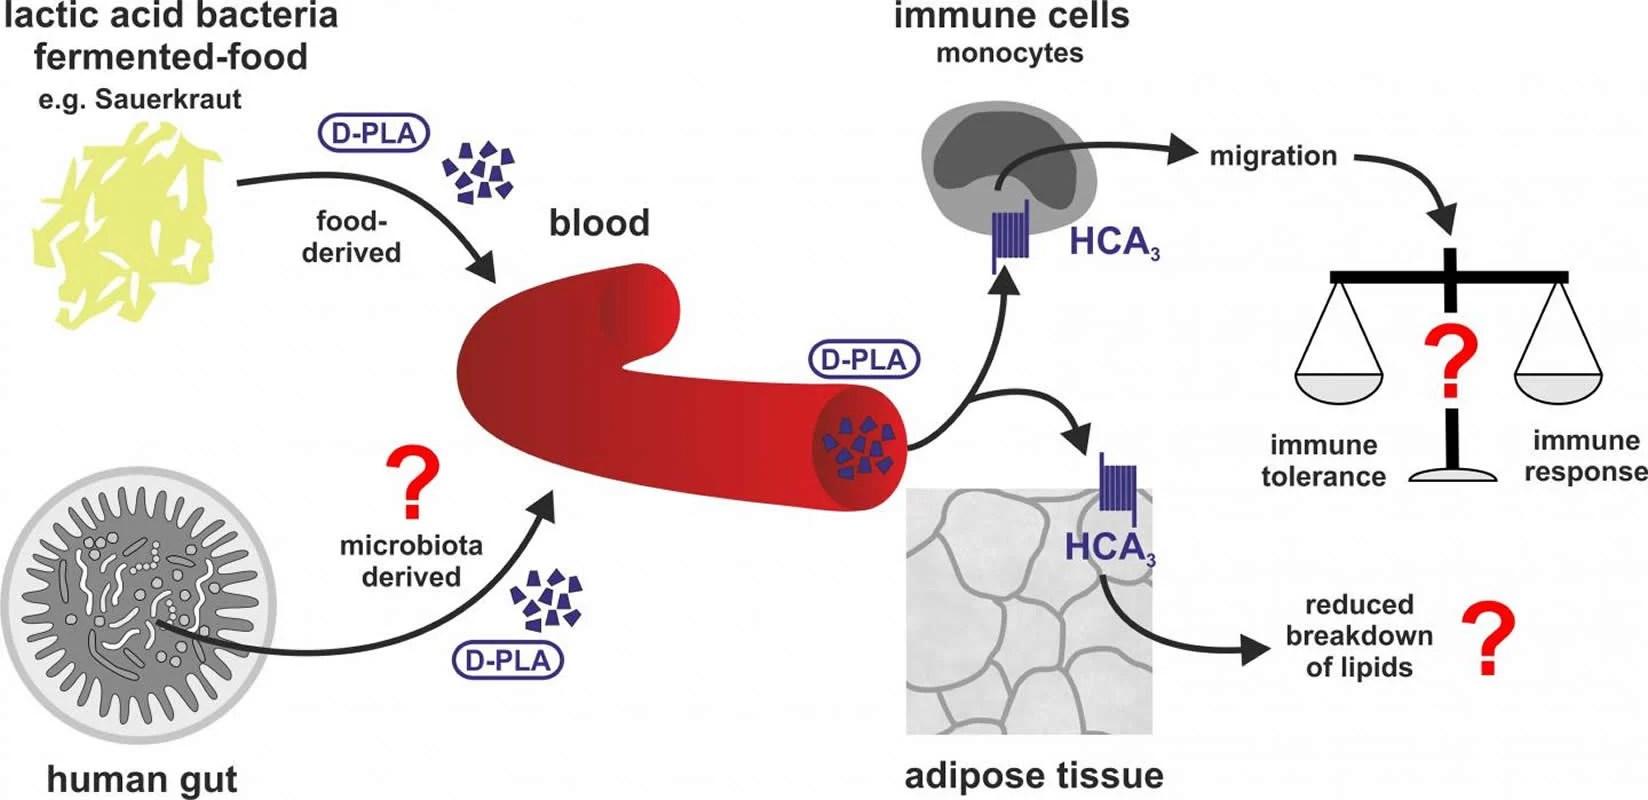 neurosciencenews.com - Bacteria in fermented food signal the human immune system, explaining health benefits